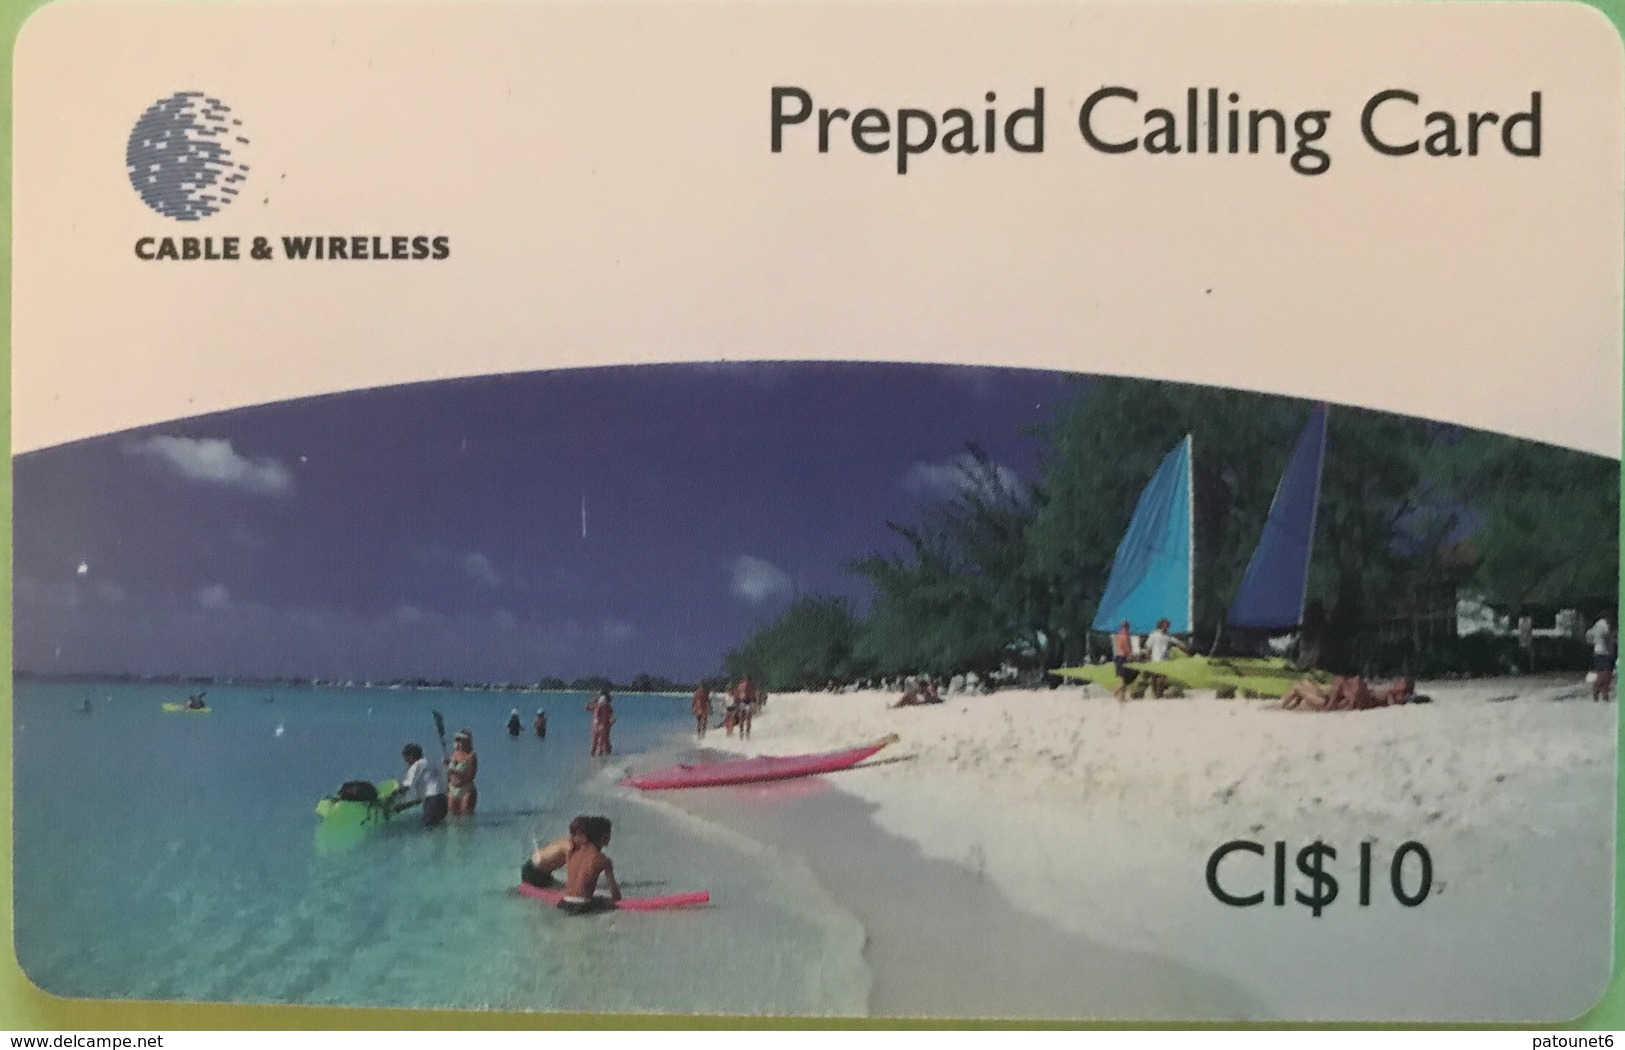 ILES CAYMAN  -  Phonecard  -  Cabble & Wirelees  -   CI $ 10 - Iles Cayman